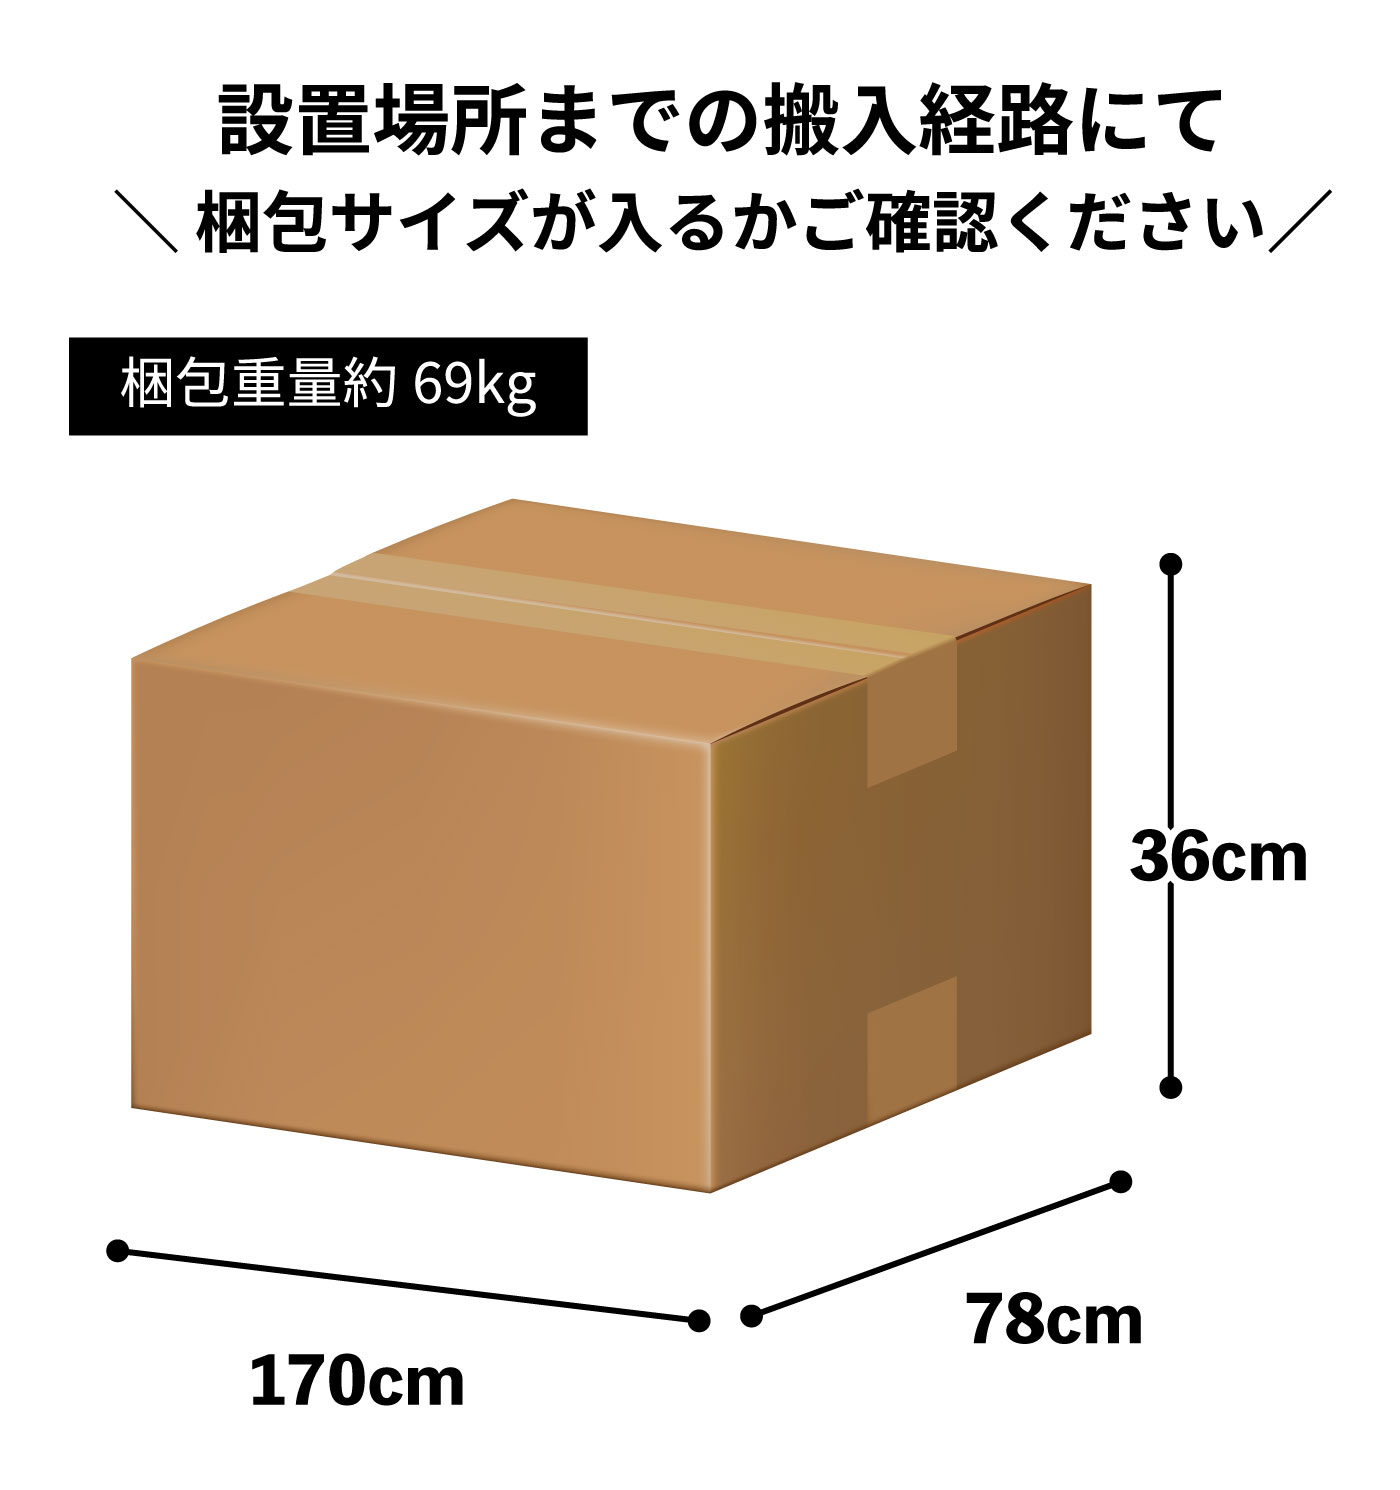 DK-9423Aの梱包サイズ